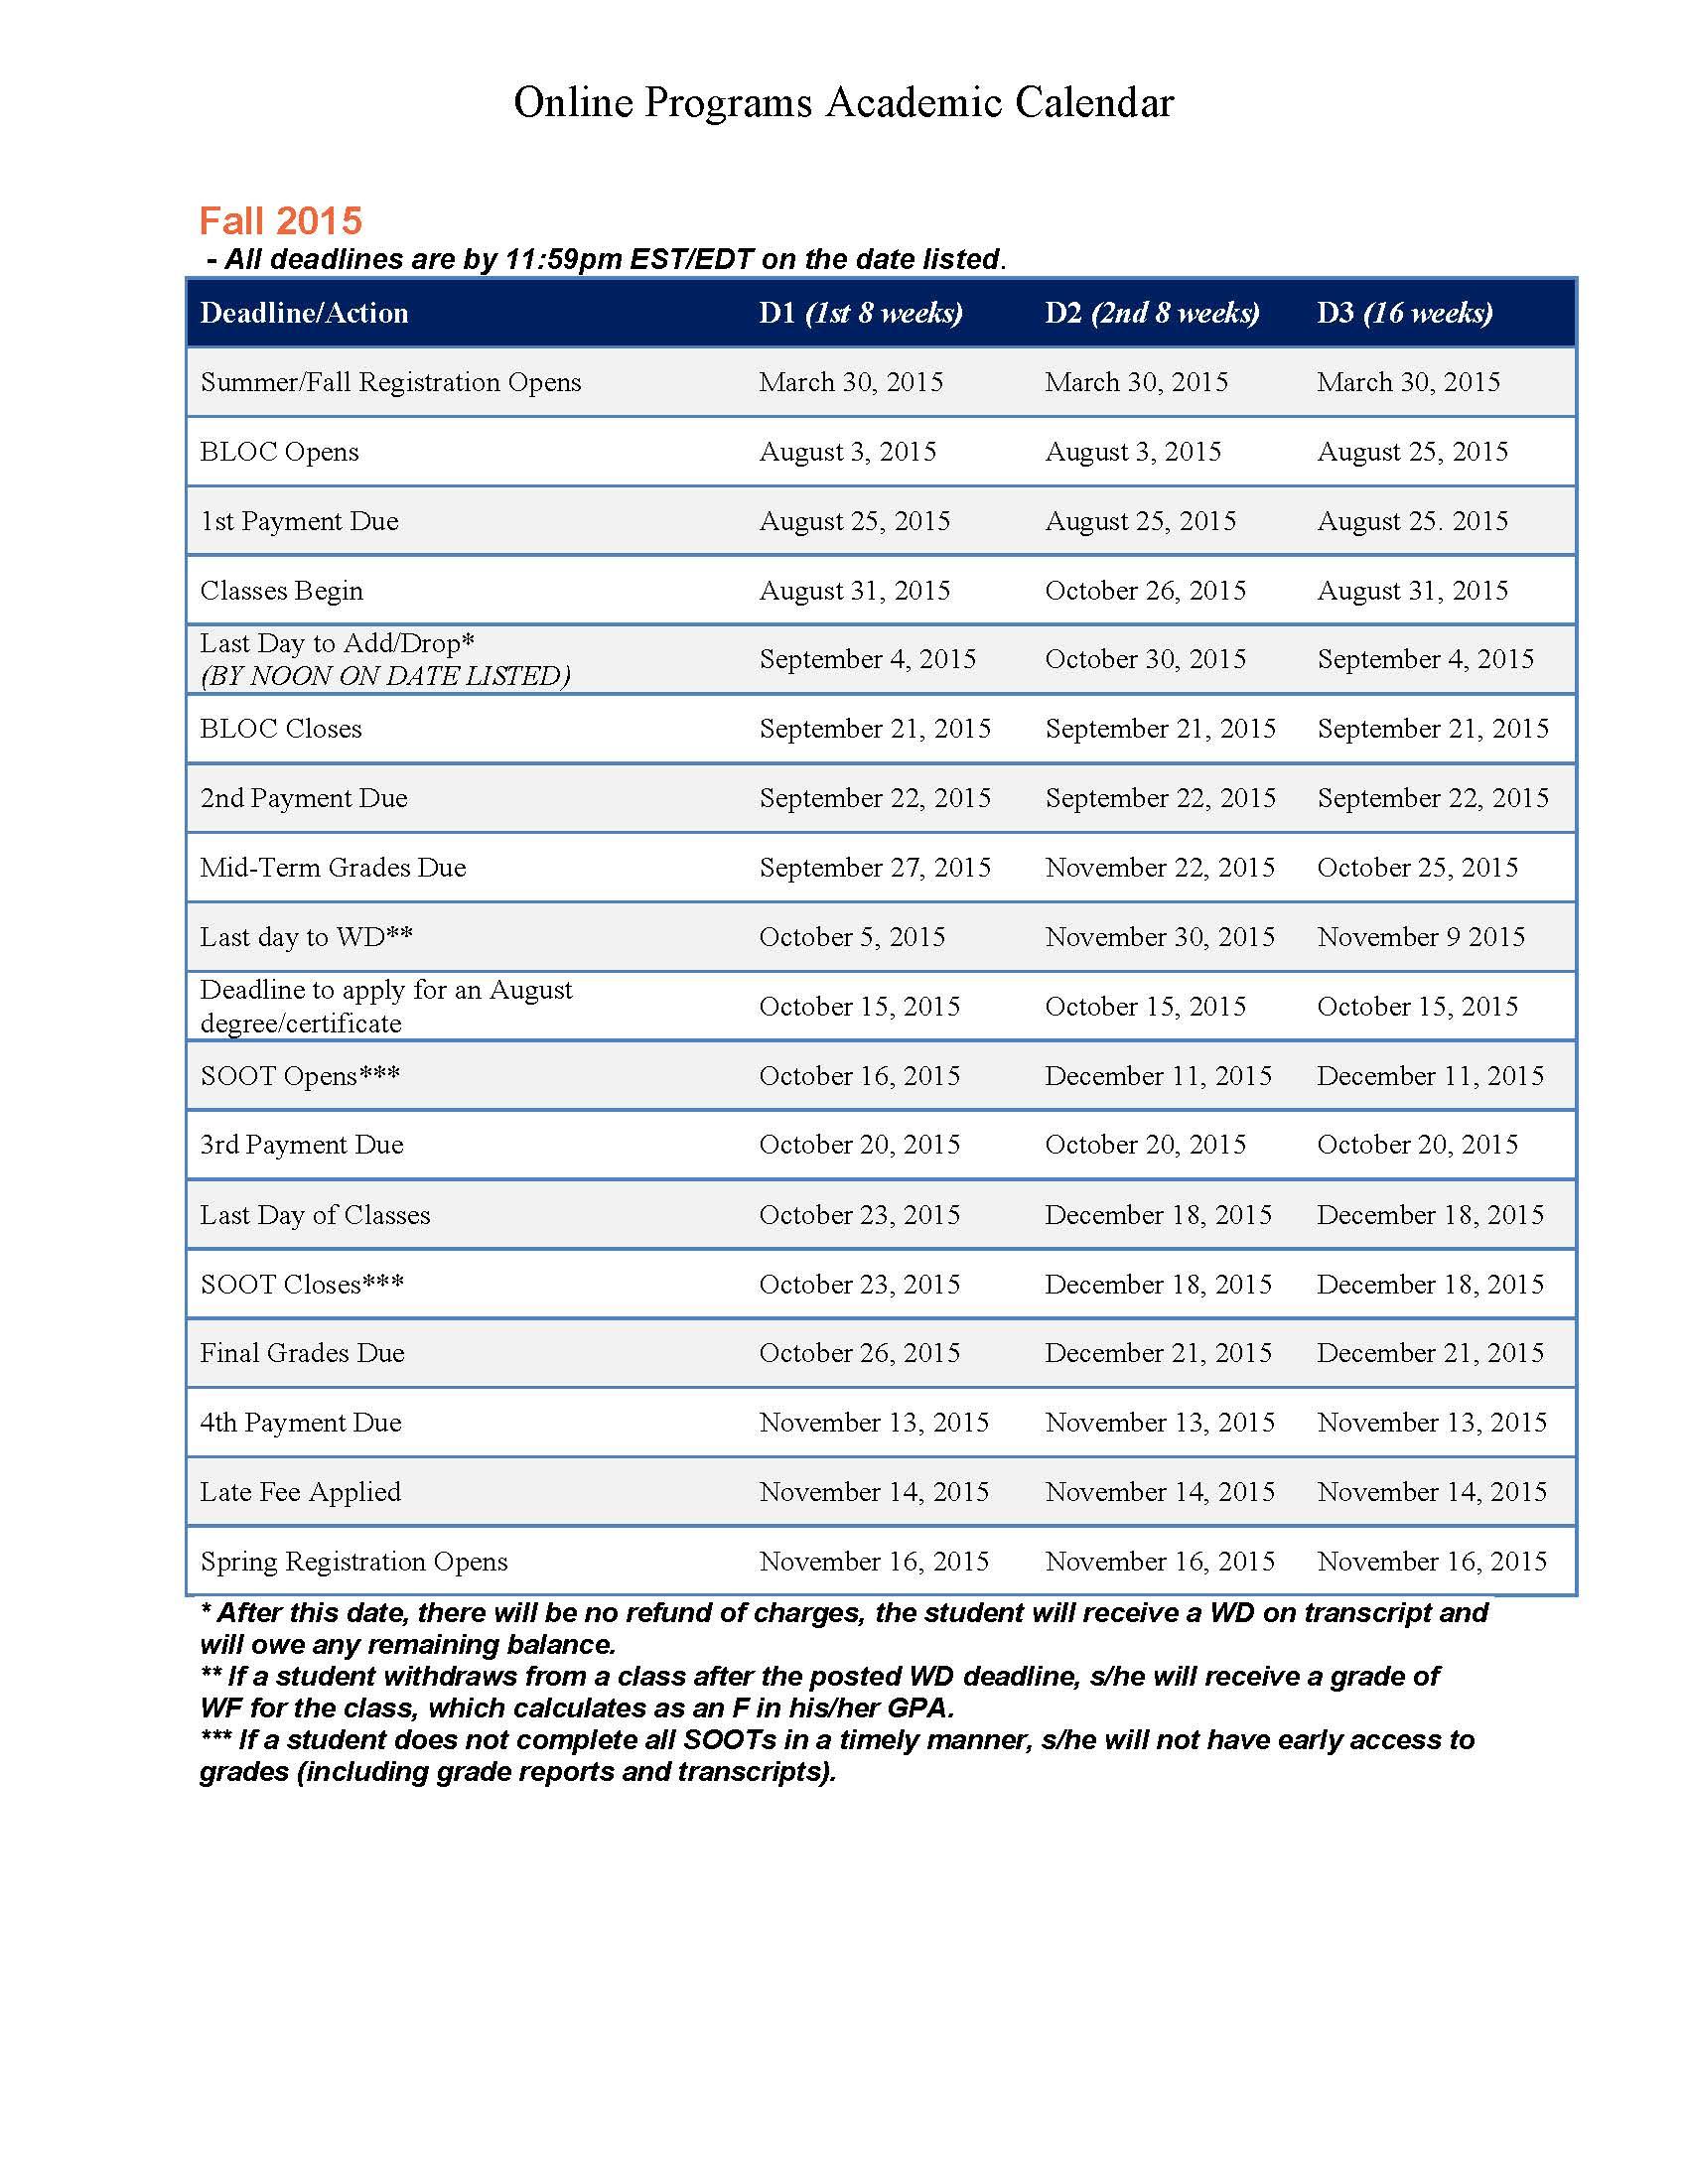 Academic Policies And Procedures - Utica College - Acalog Acms™ with regard to Indiana Weselyn Online Studies Calendar